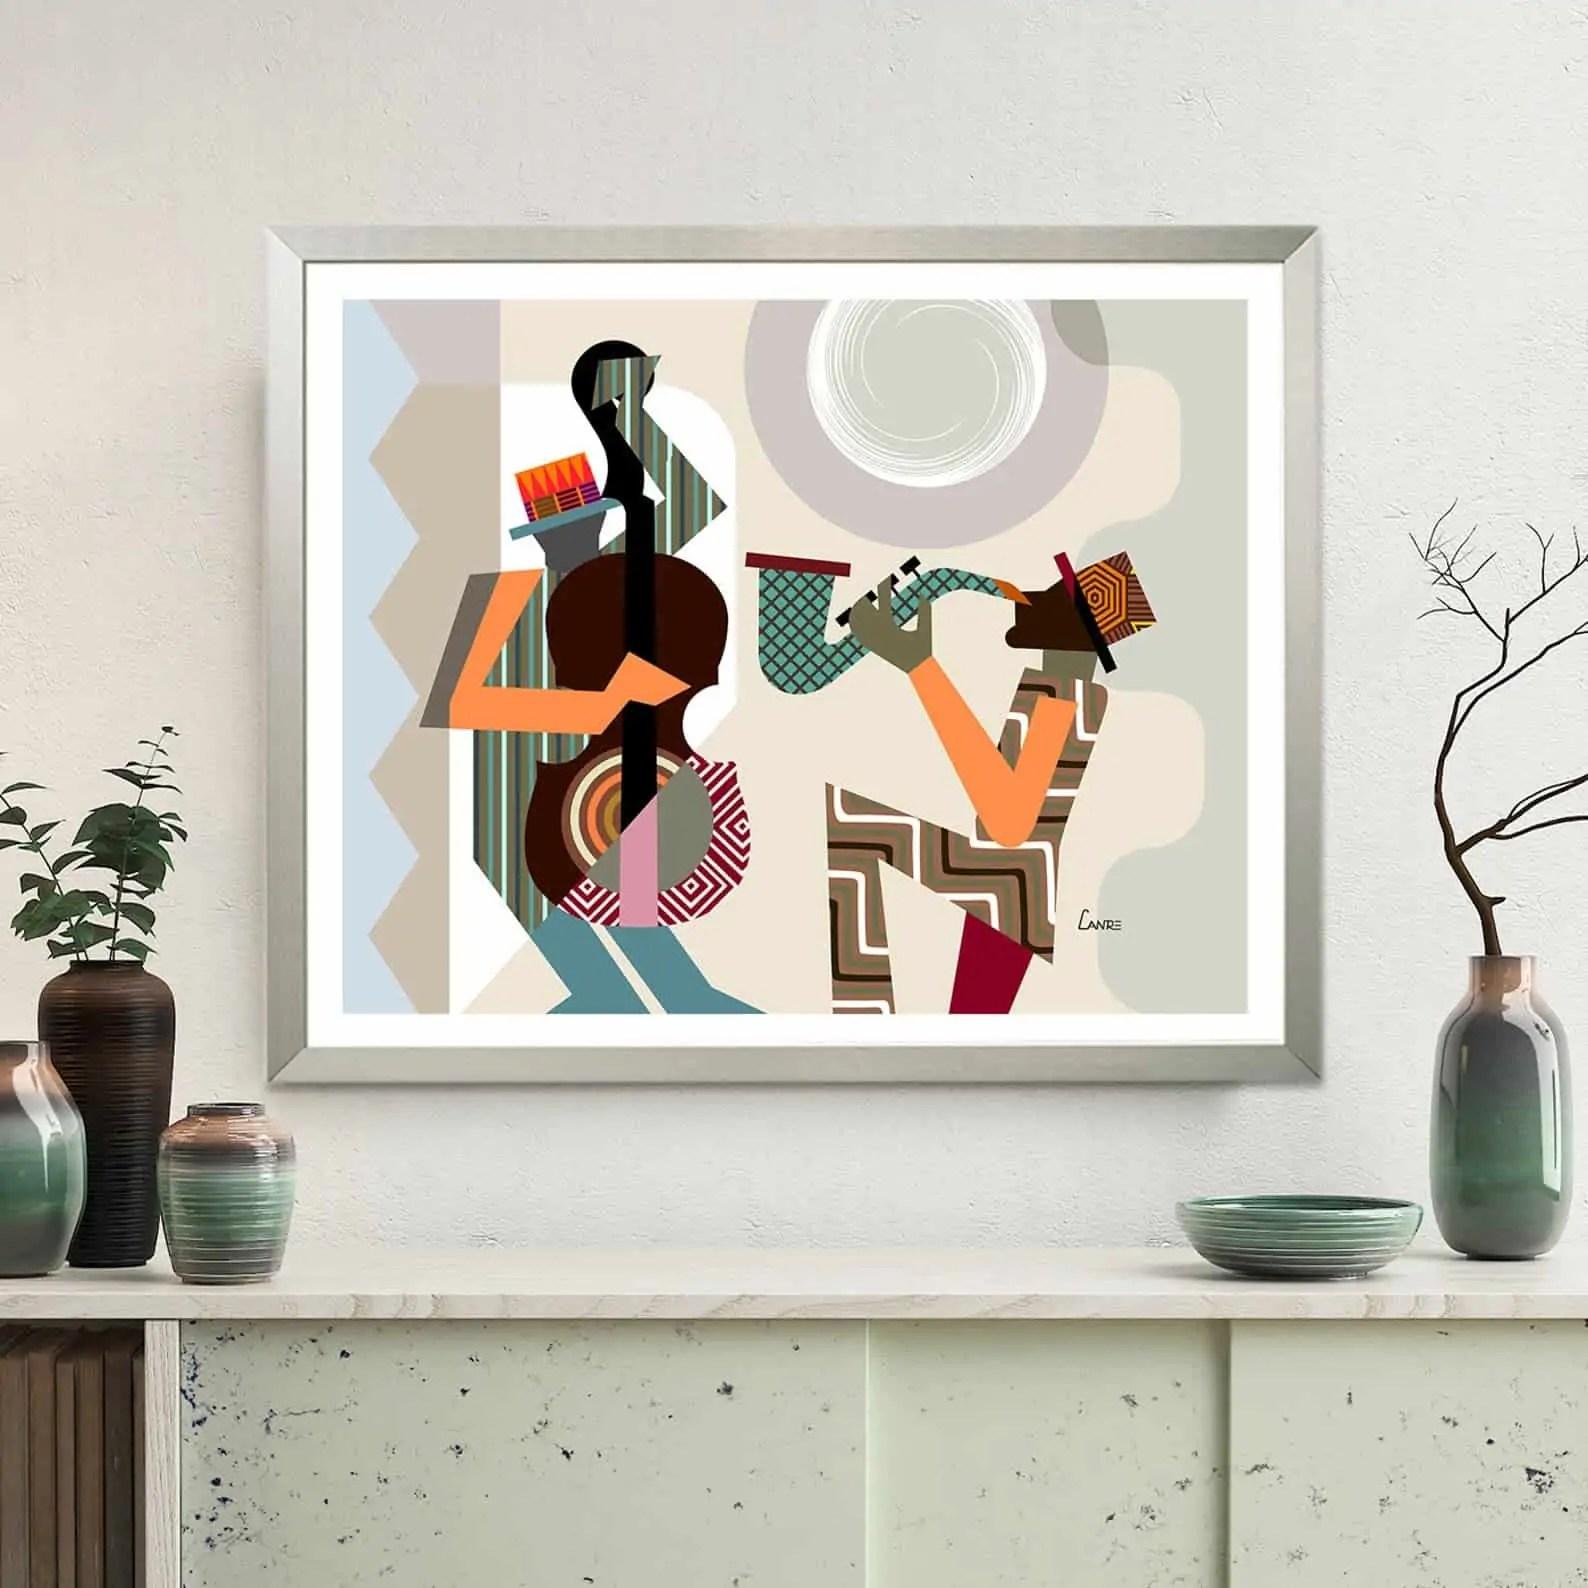 Jazz Festival Orleans Music Poster, Saxophone Violin Wall Art | LanreStudio